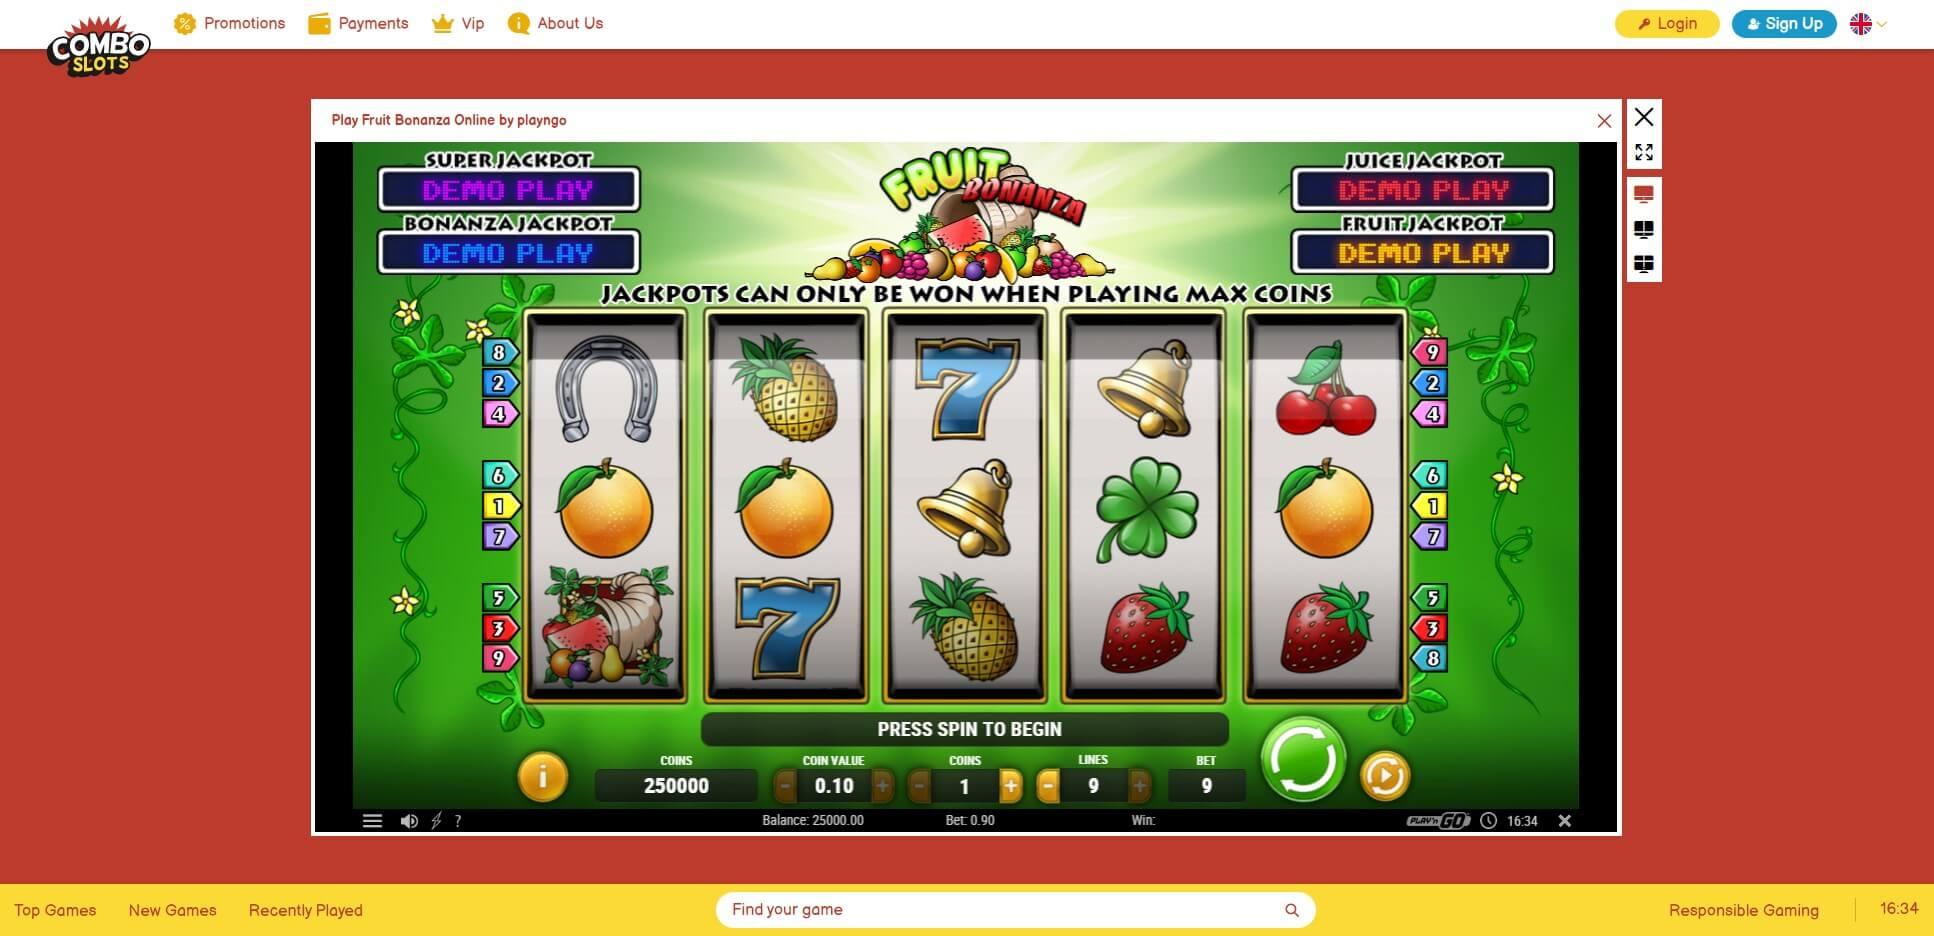 Game Play at Comboslots Casino